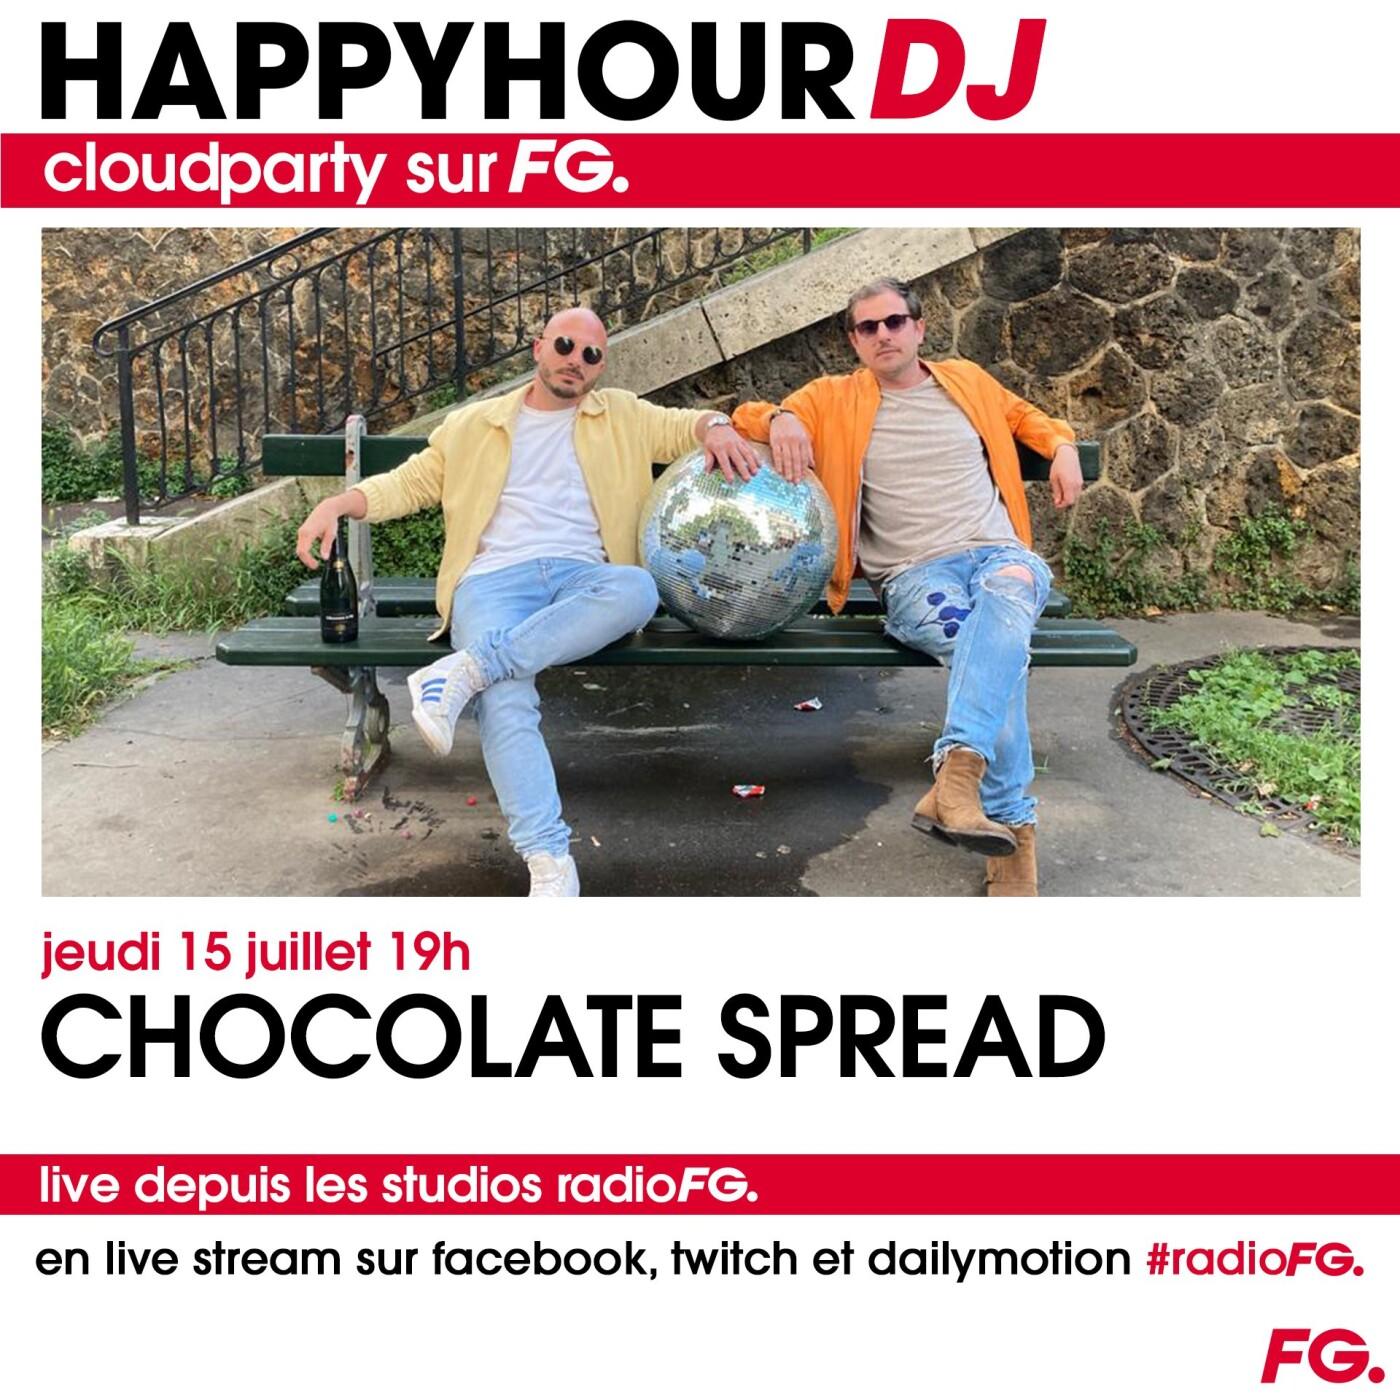 HAPPY HOUR DJ : CHOCOLATE SPRE